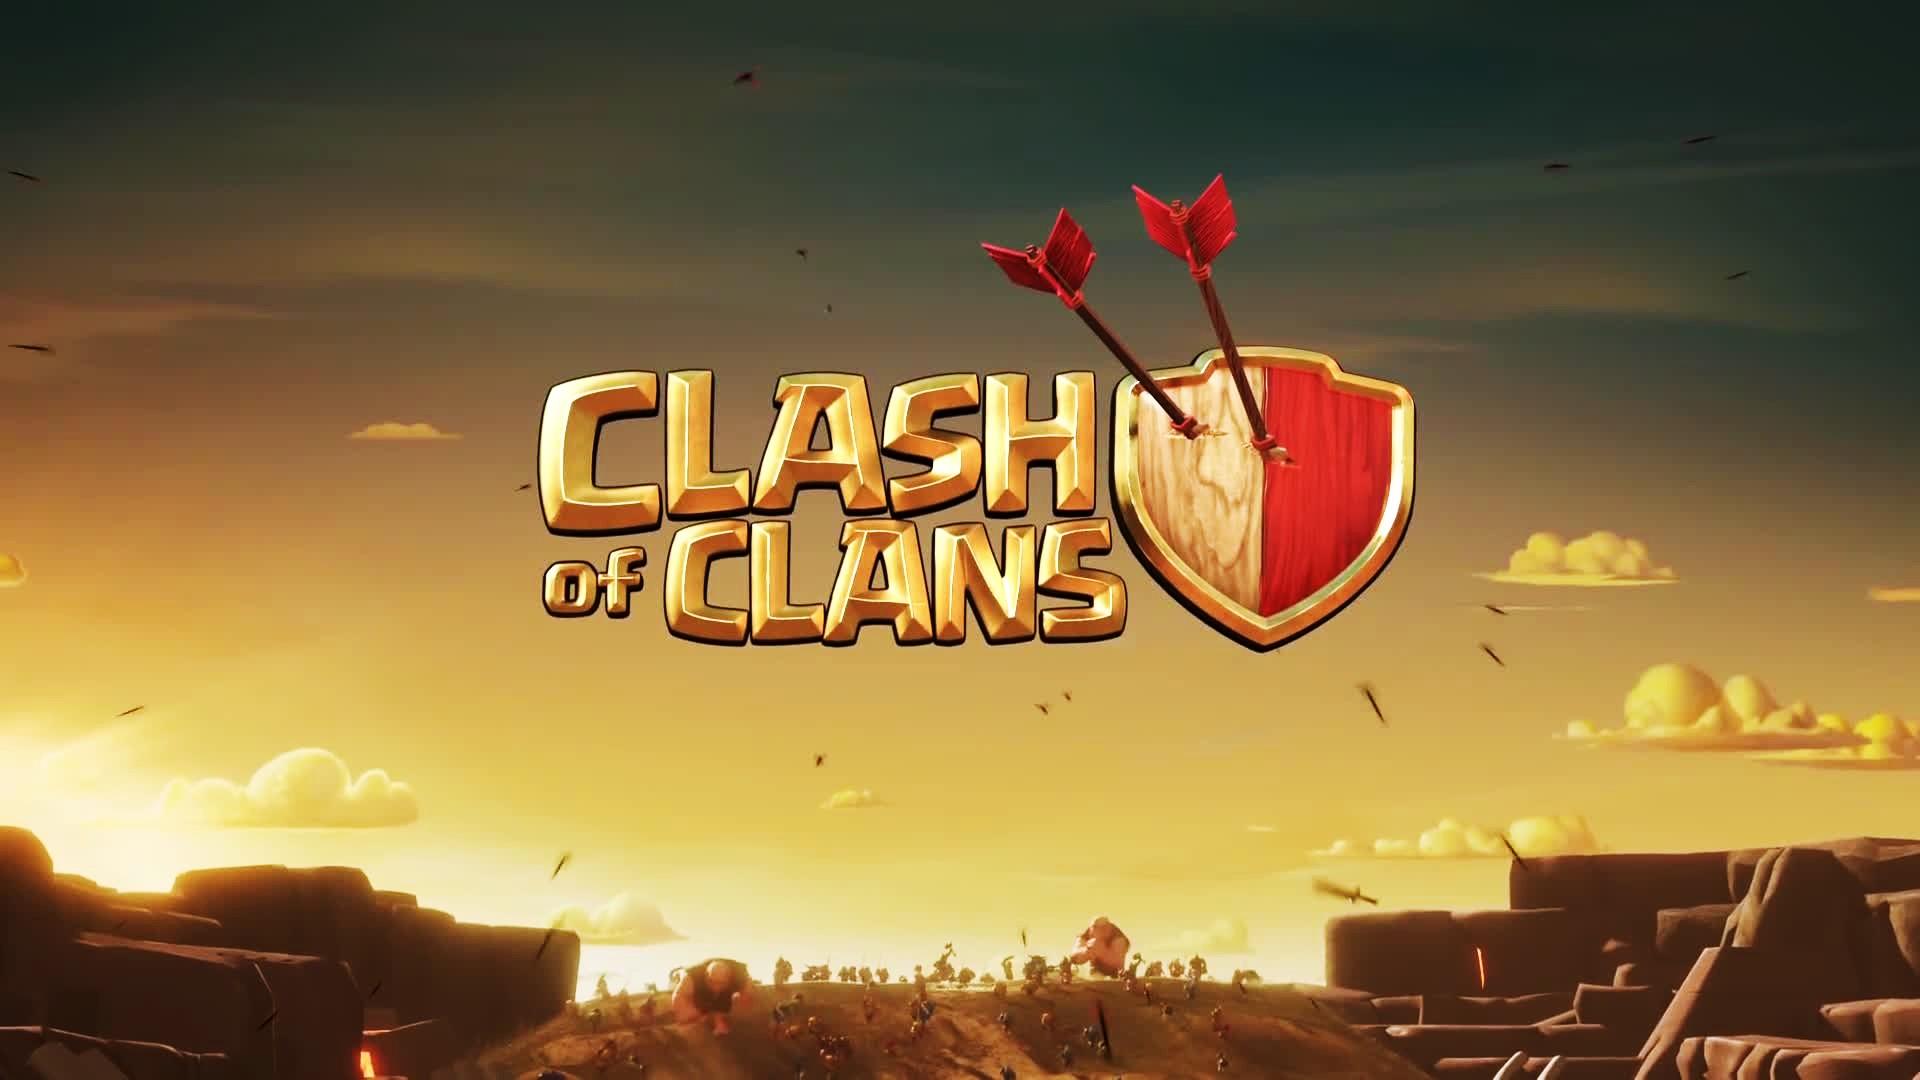 Clash Of Clans Hq Desktop Wallpaper - Clash Of Clans Background , HD Wallpaper & Backgrounds